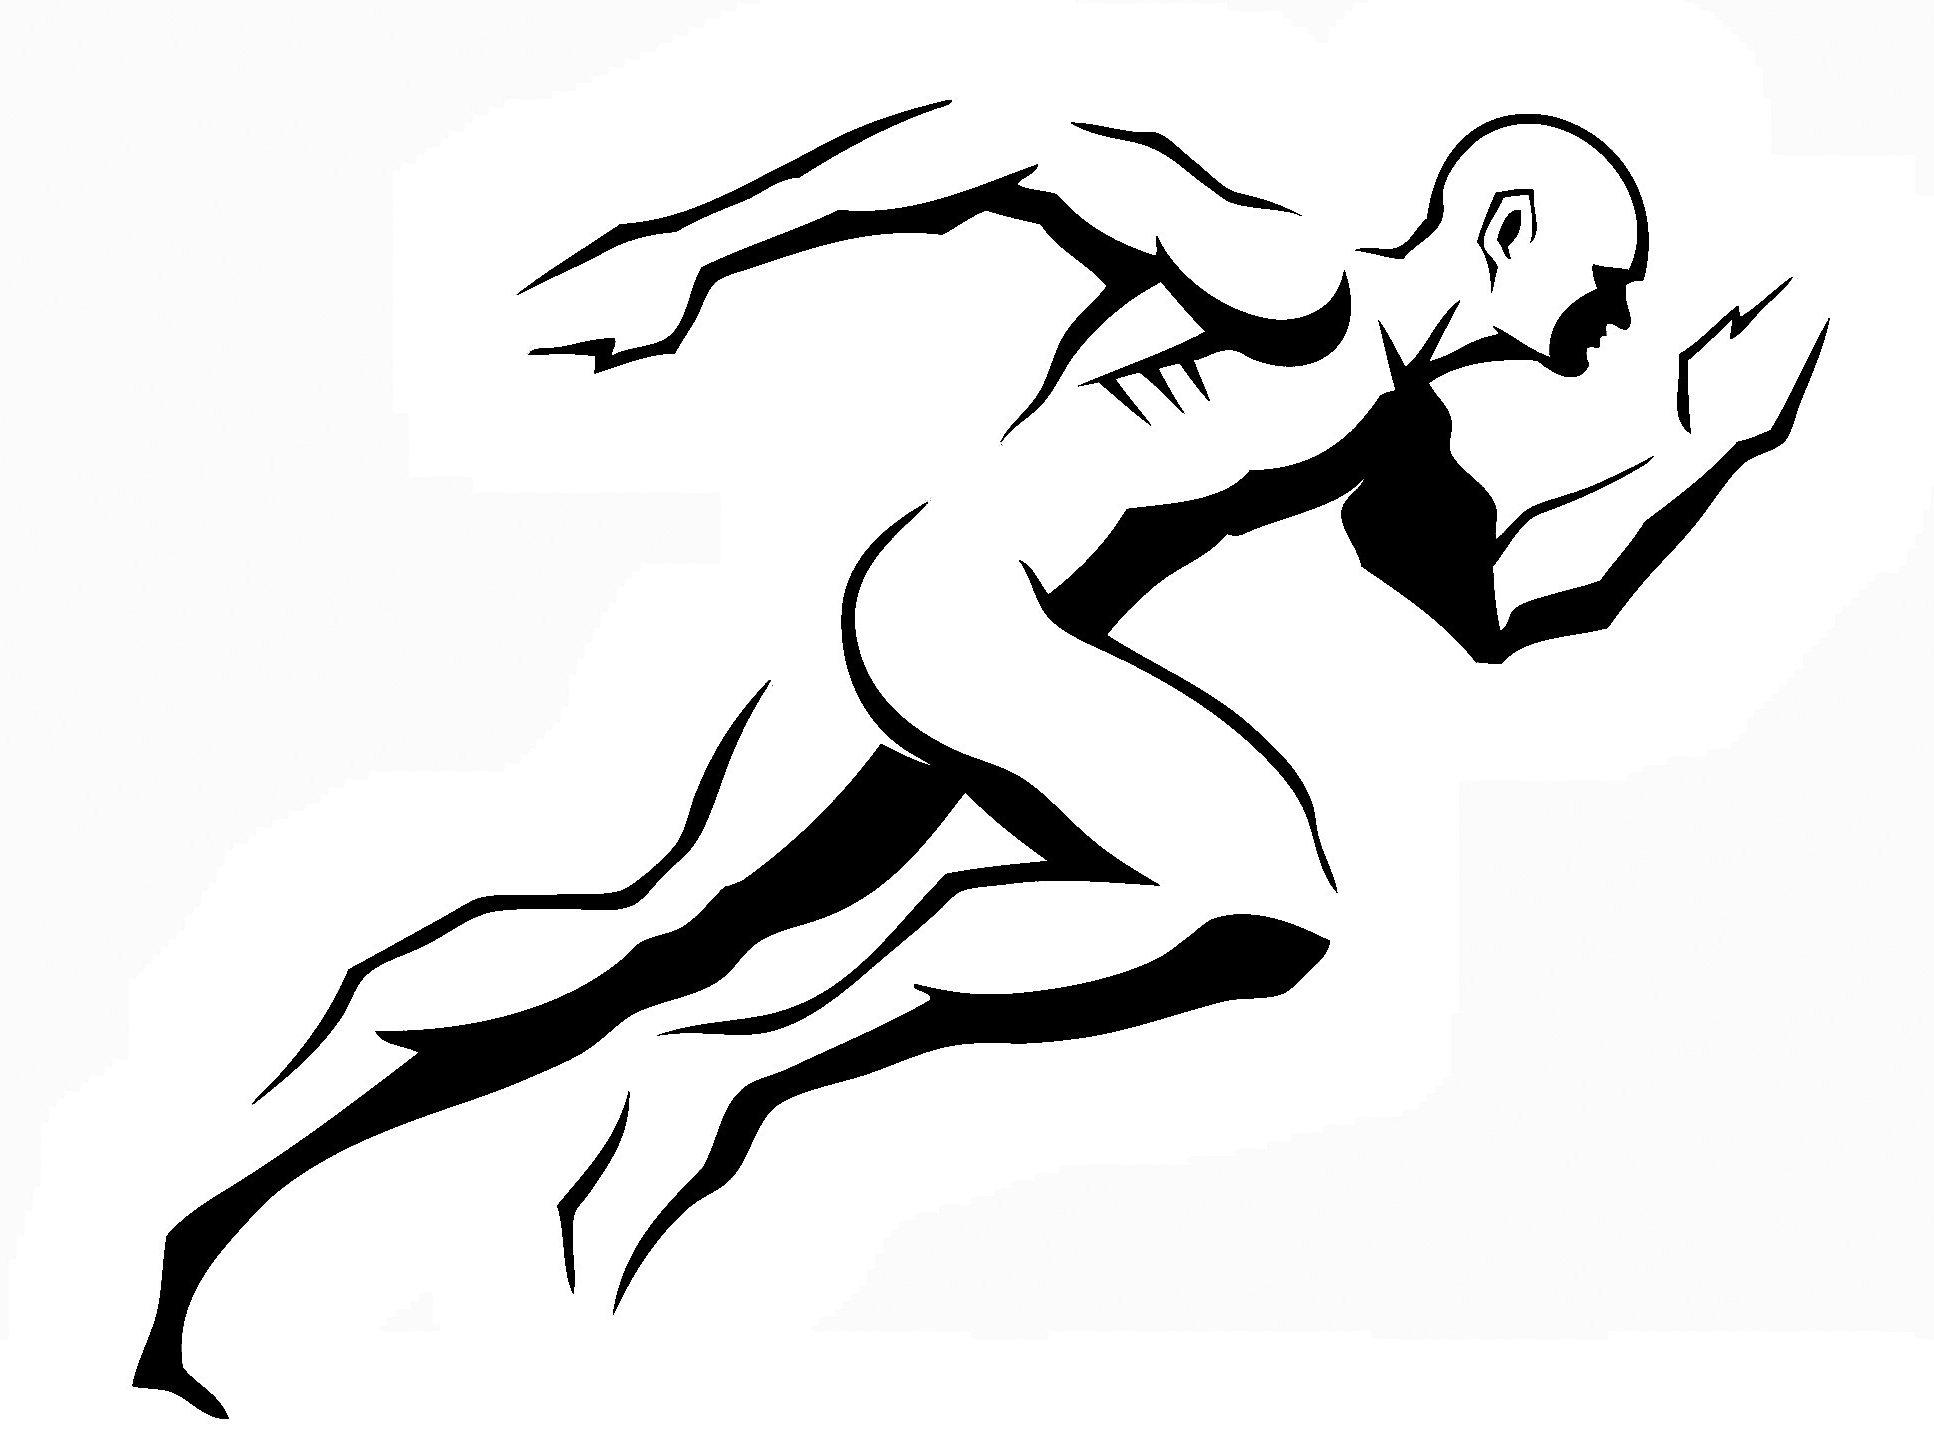 Logo With Running Man